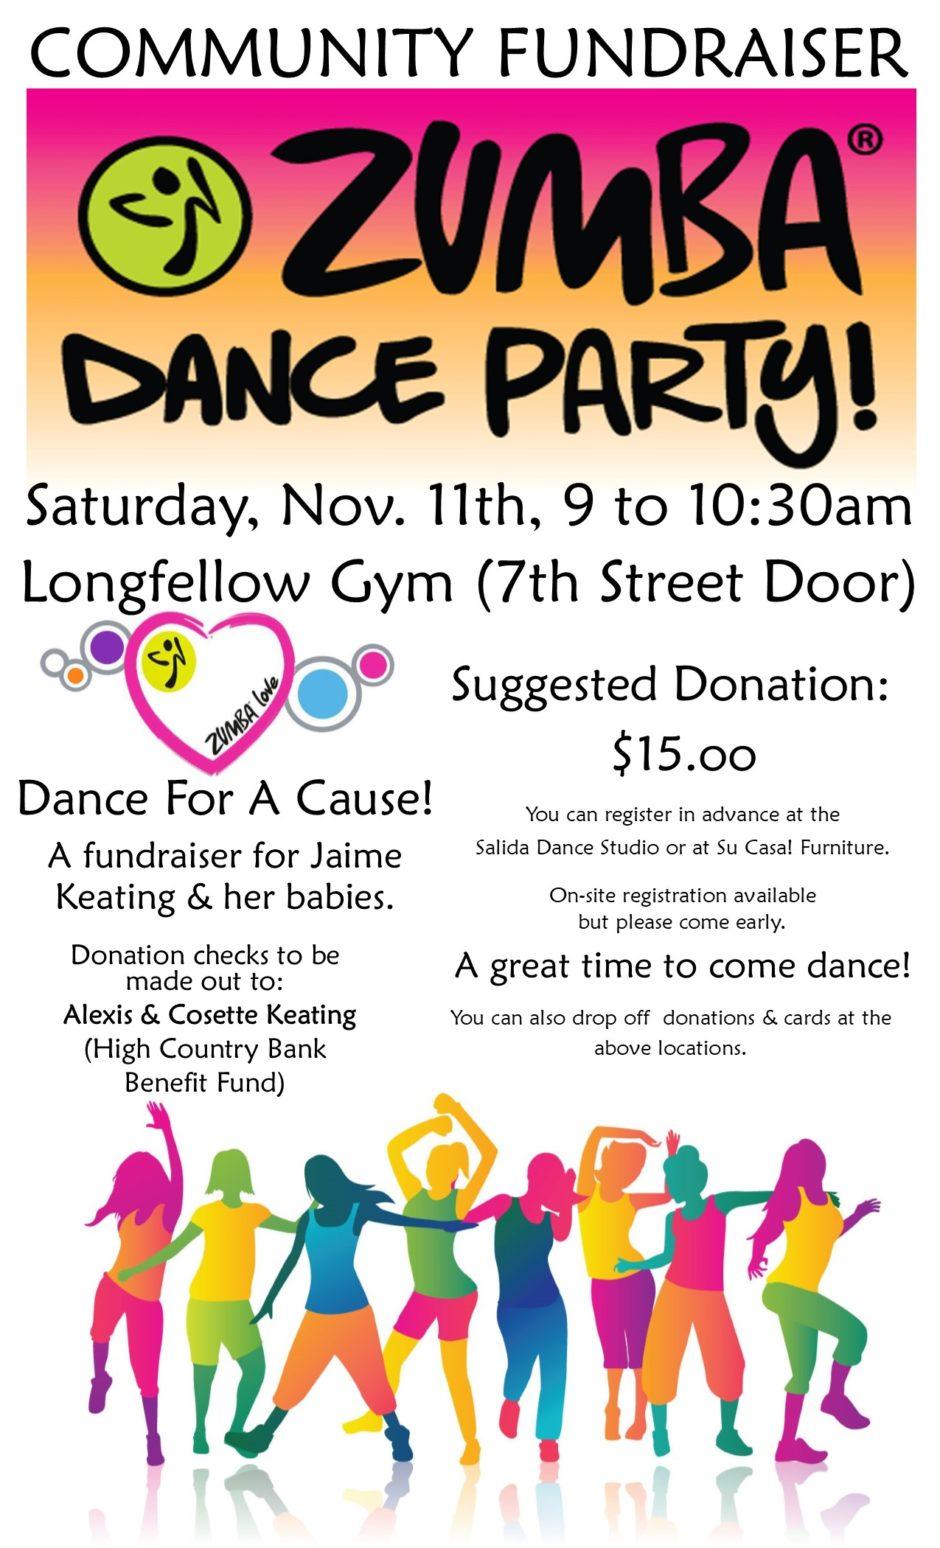 Zumba Christmas Party Images.Zumba Dance Party Community Fundraiser Salida Chamber Of